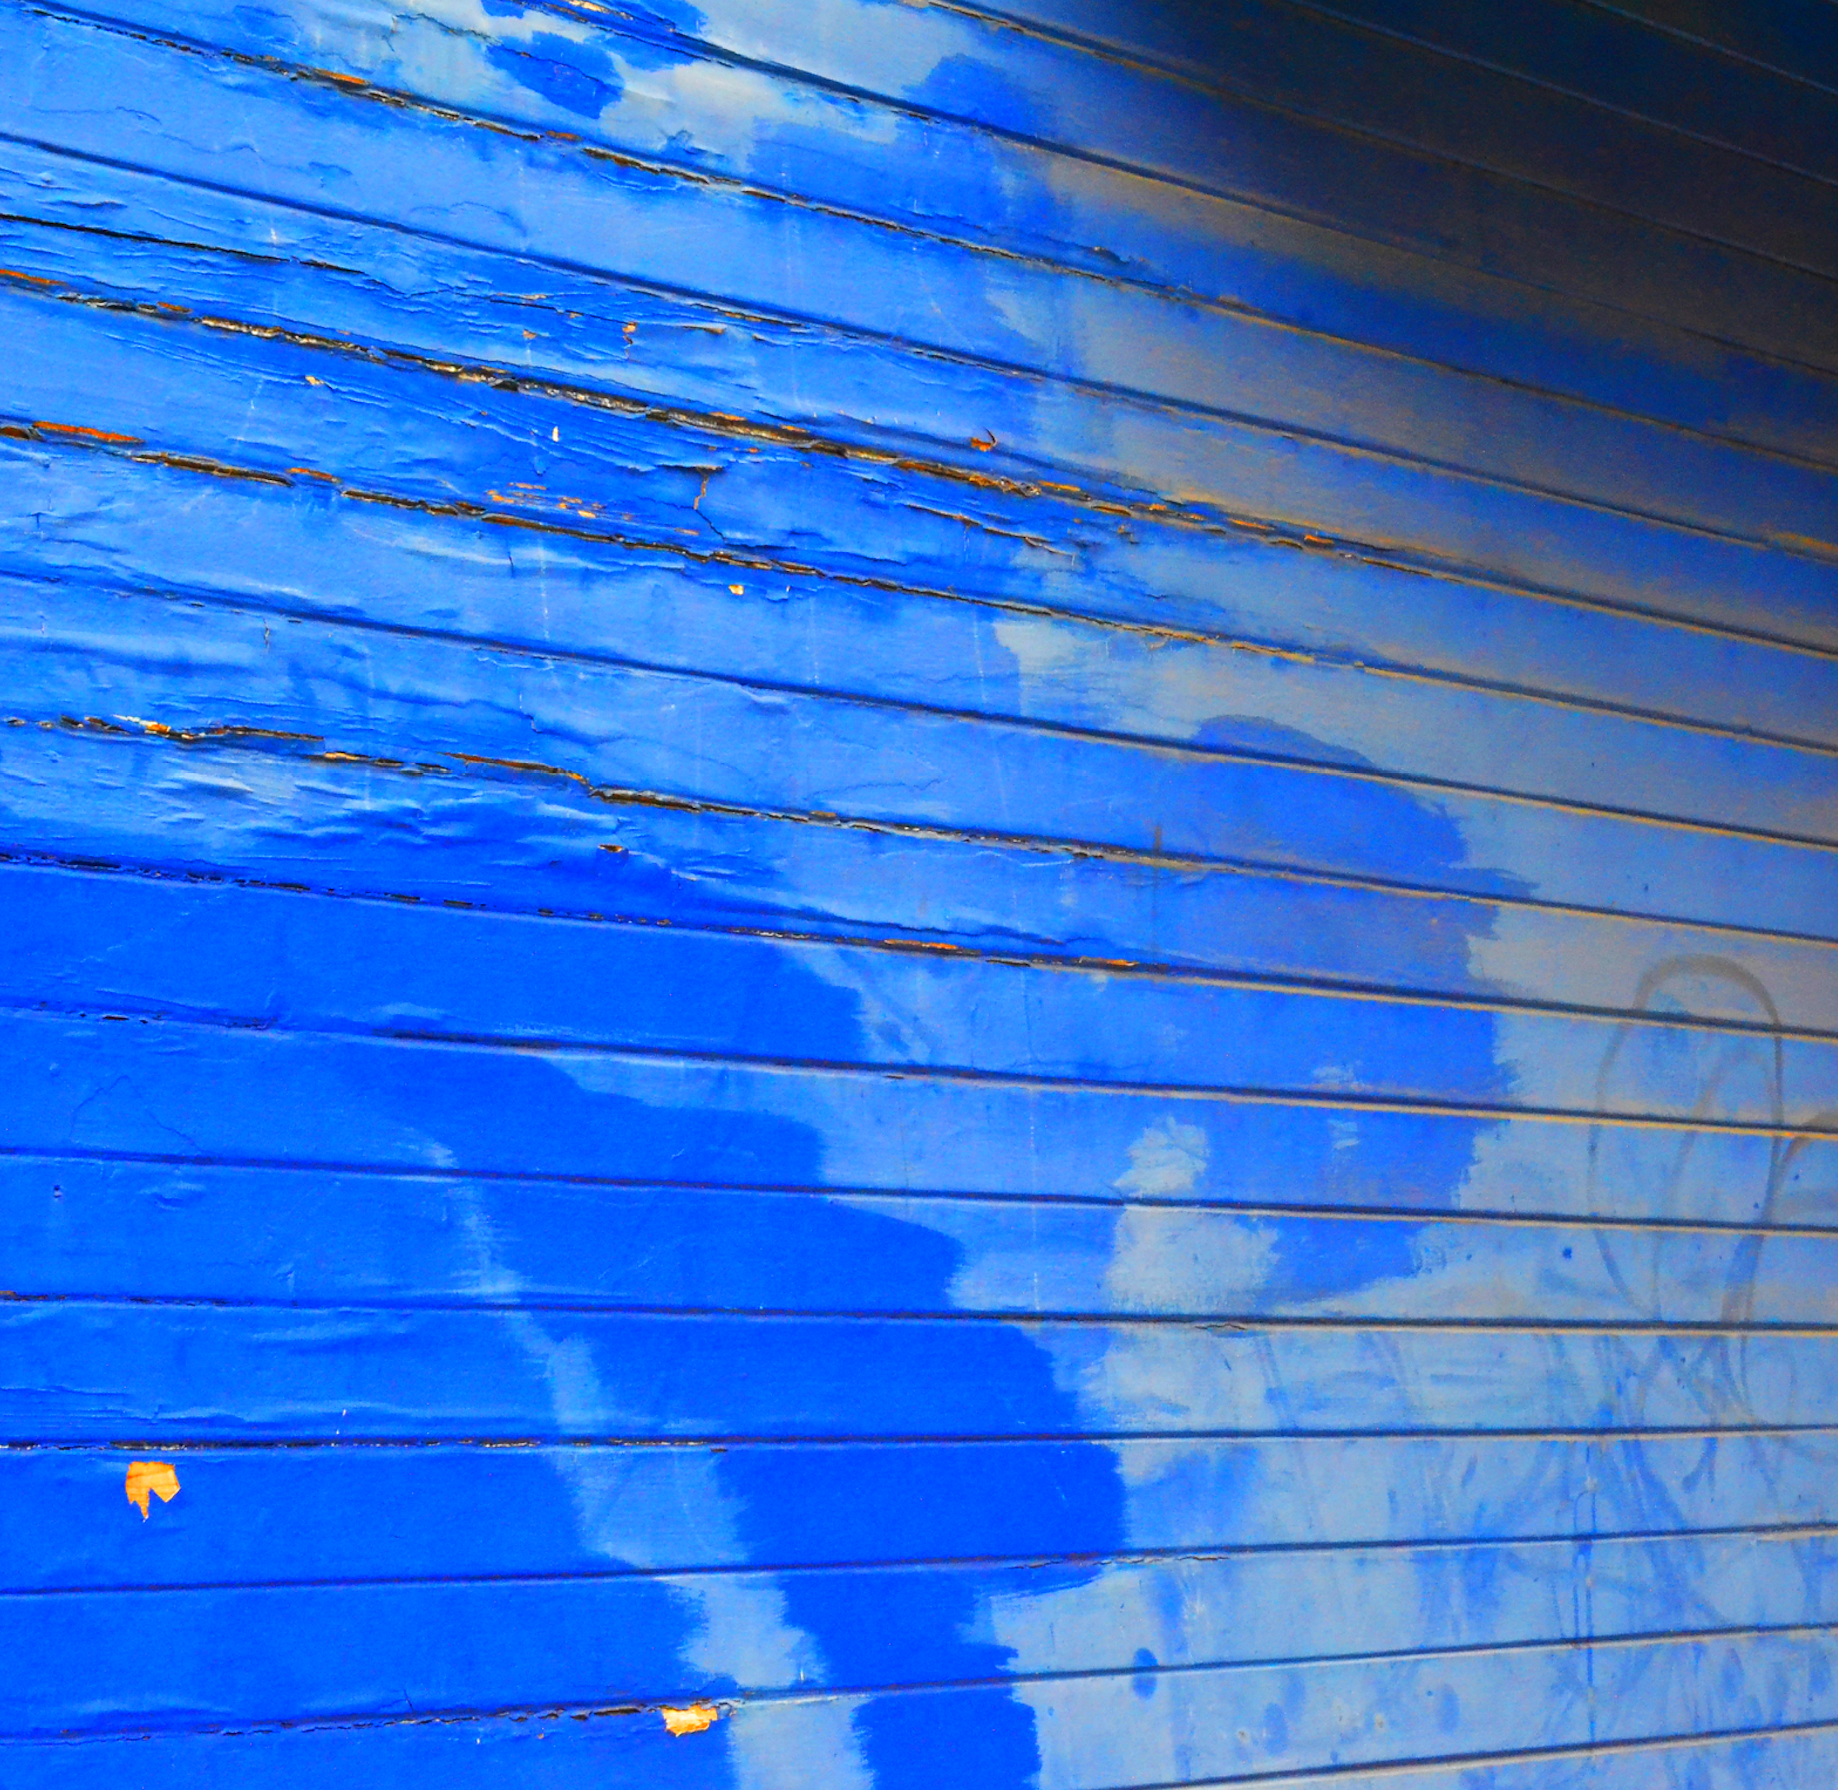 Aliana+Grace+Bailey+San+Francisco+California+Houses+Texture+Blue.png